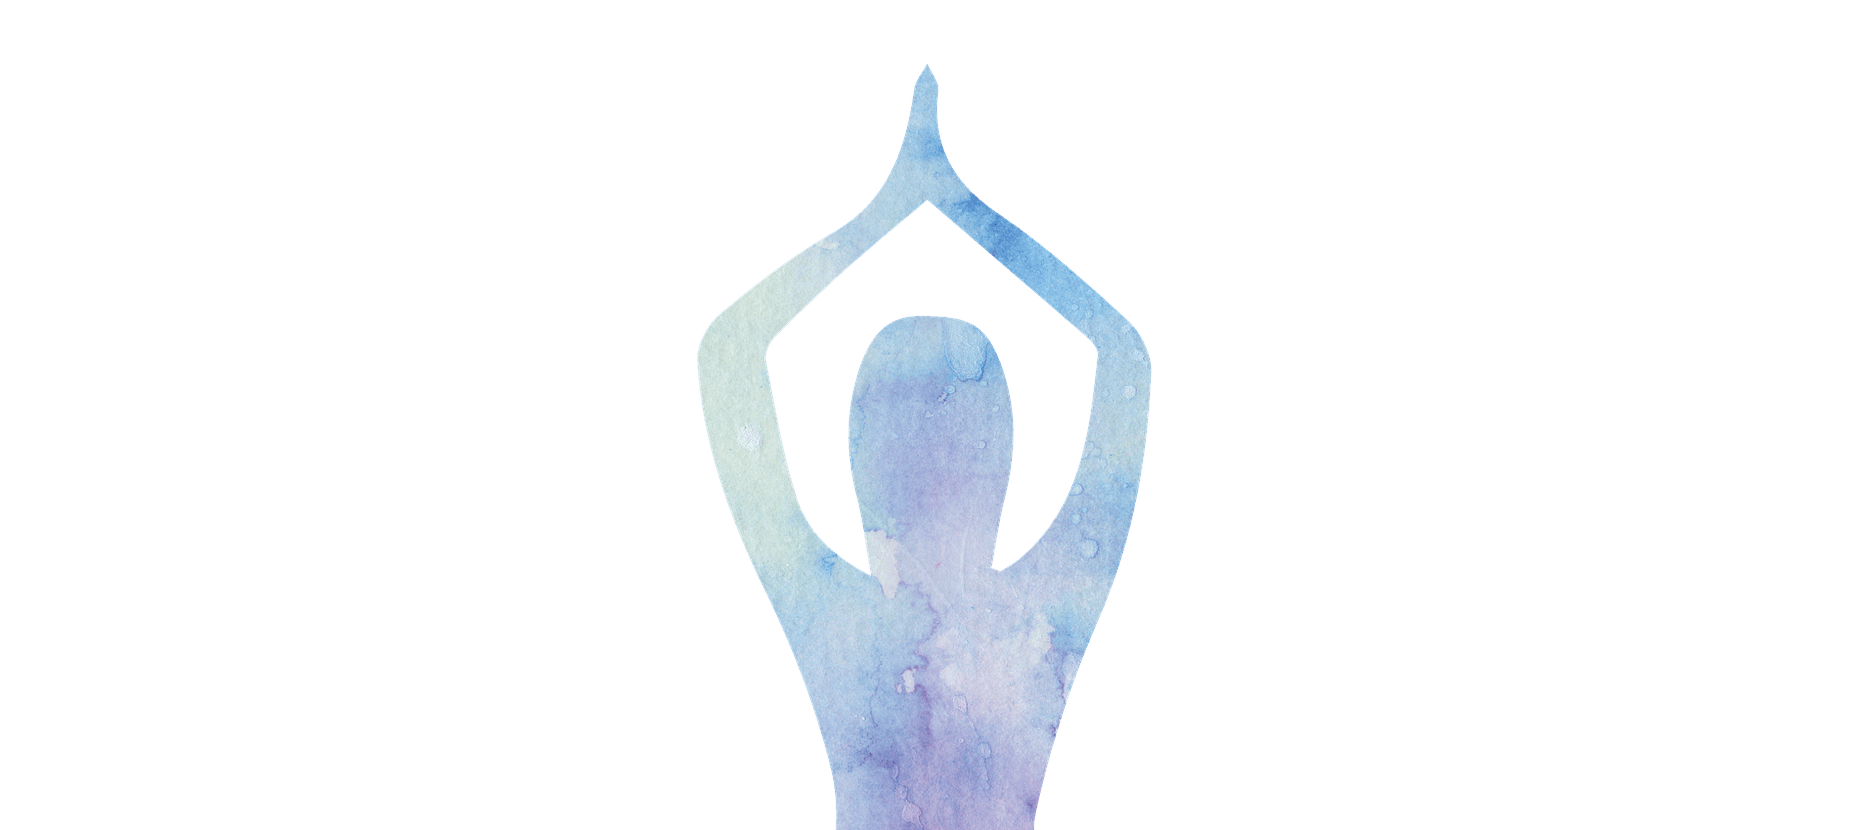 yoga-1883417_1920-e1567363833471.png